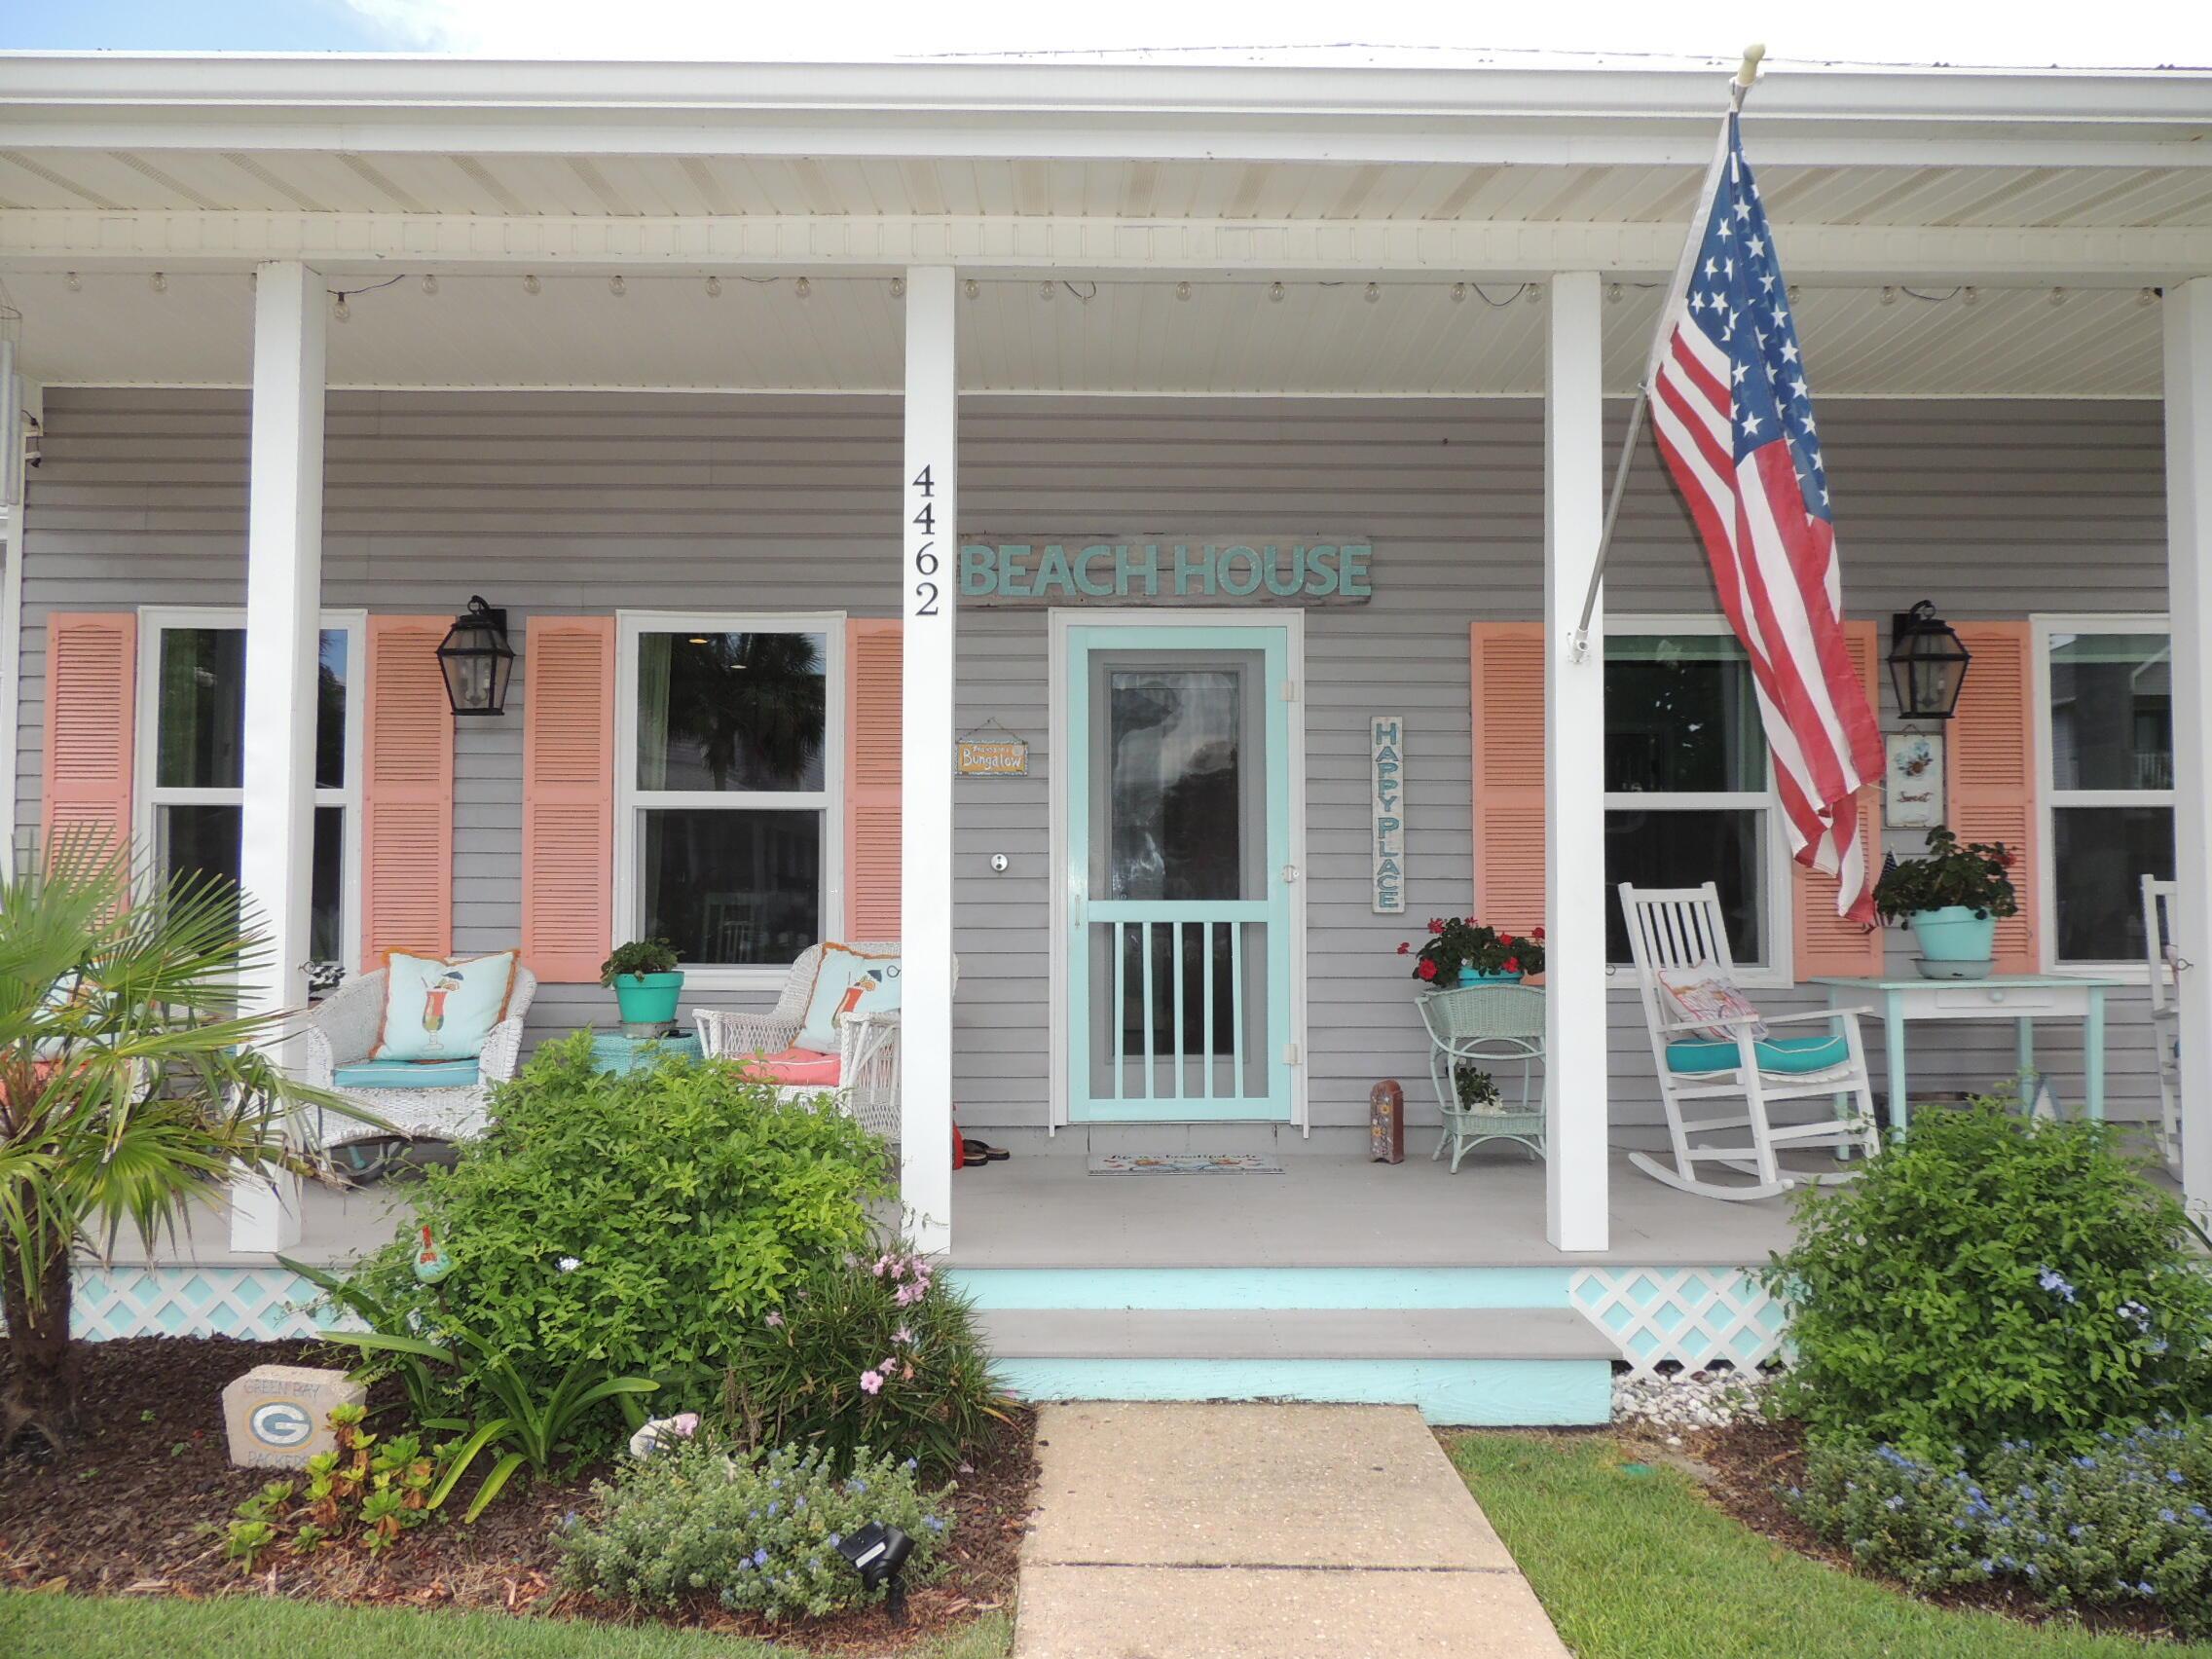 Porch view